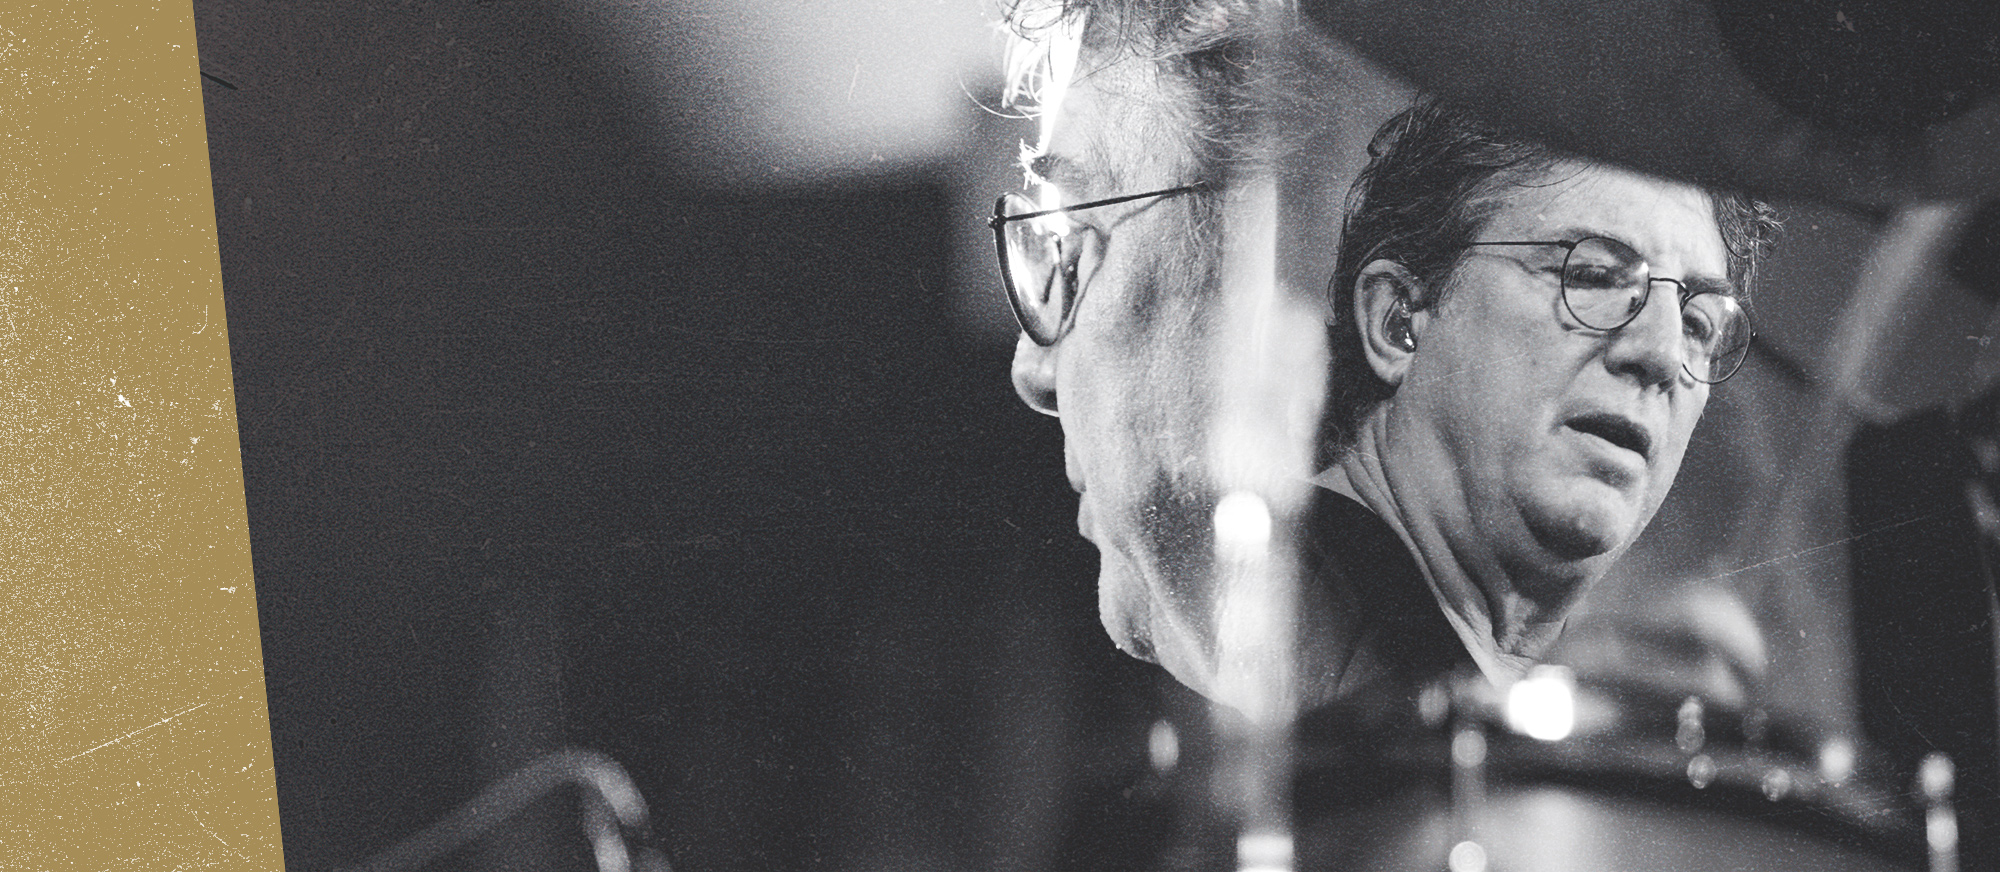 Tom Brechtlein playing drums